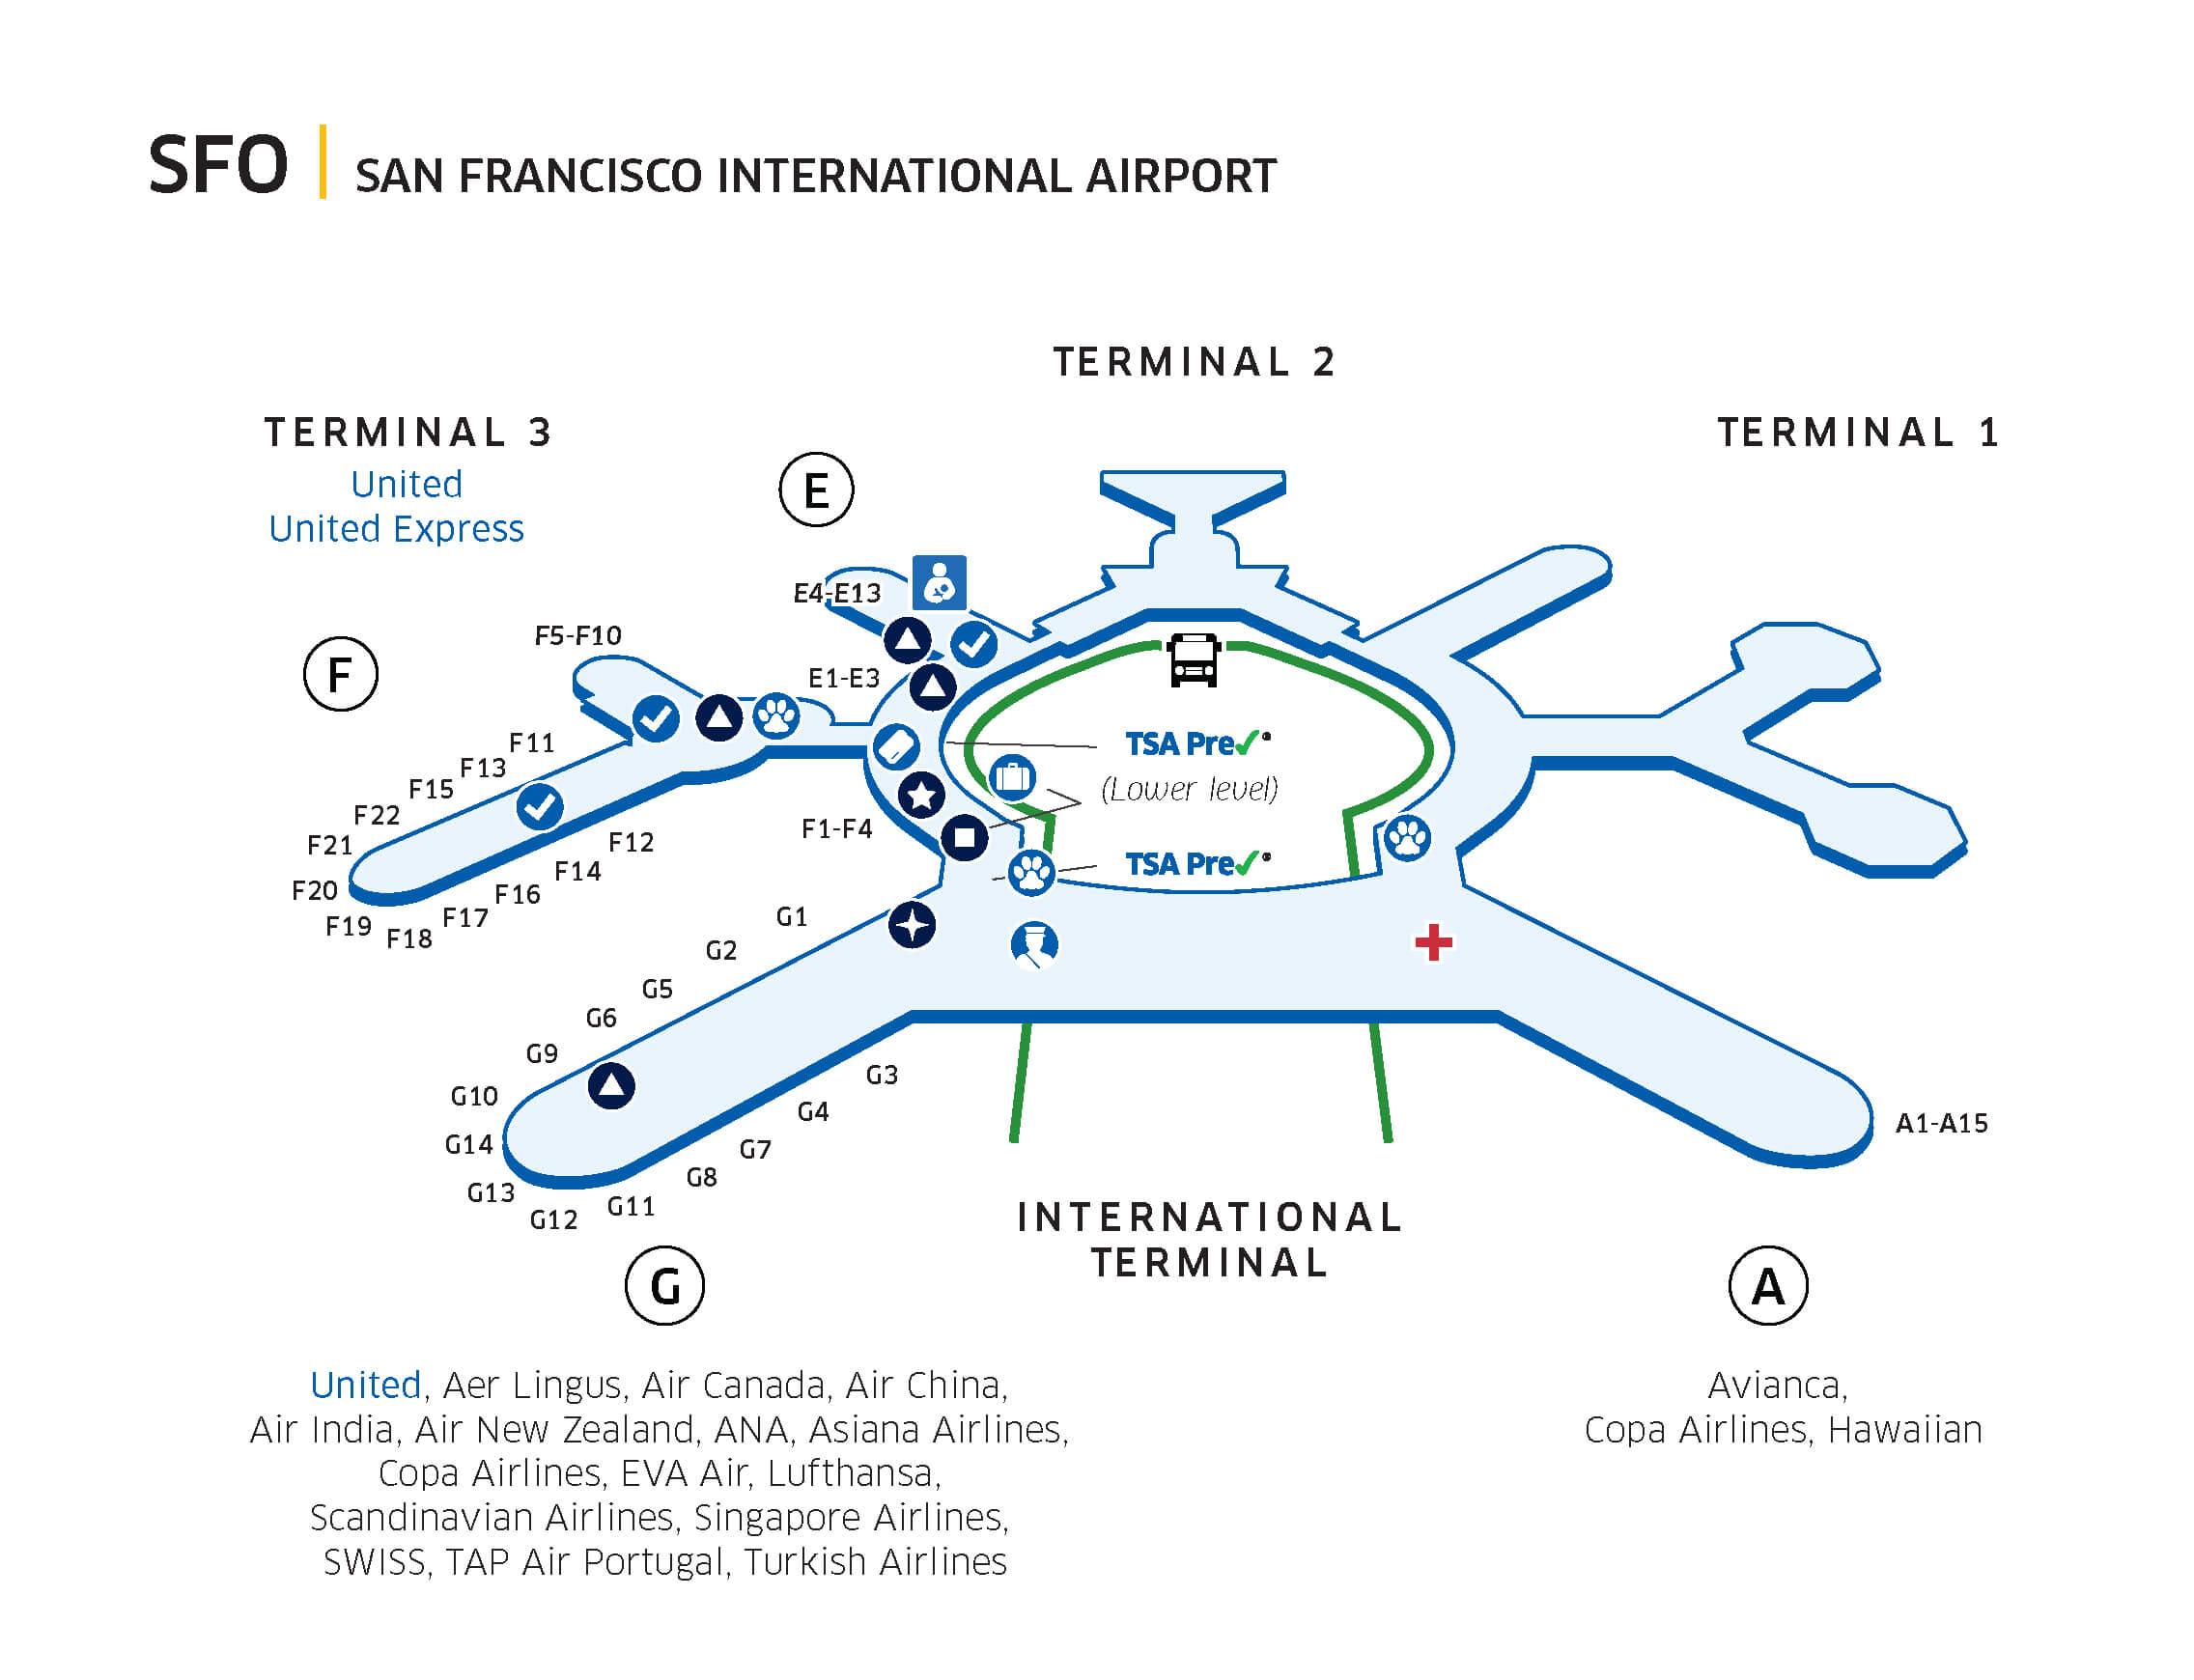 San Francisco International Airport (SFO) - Starting October 16, 2019